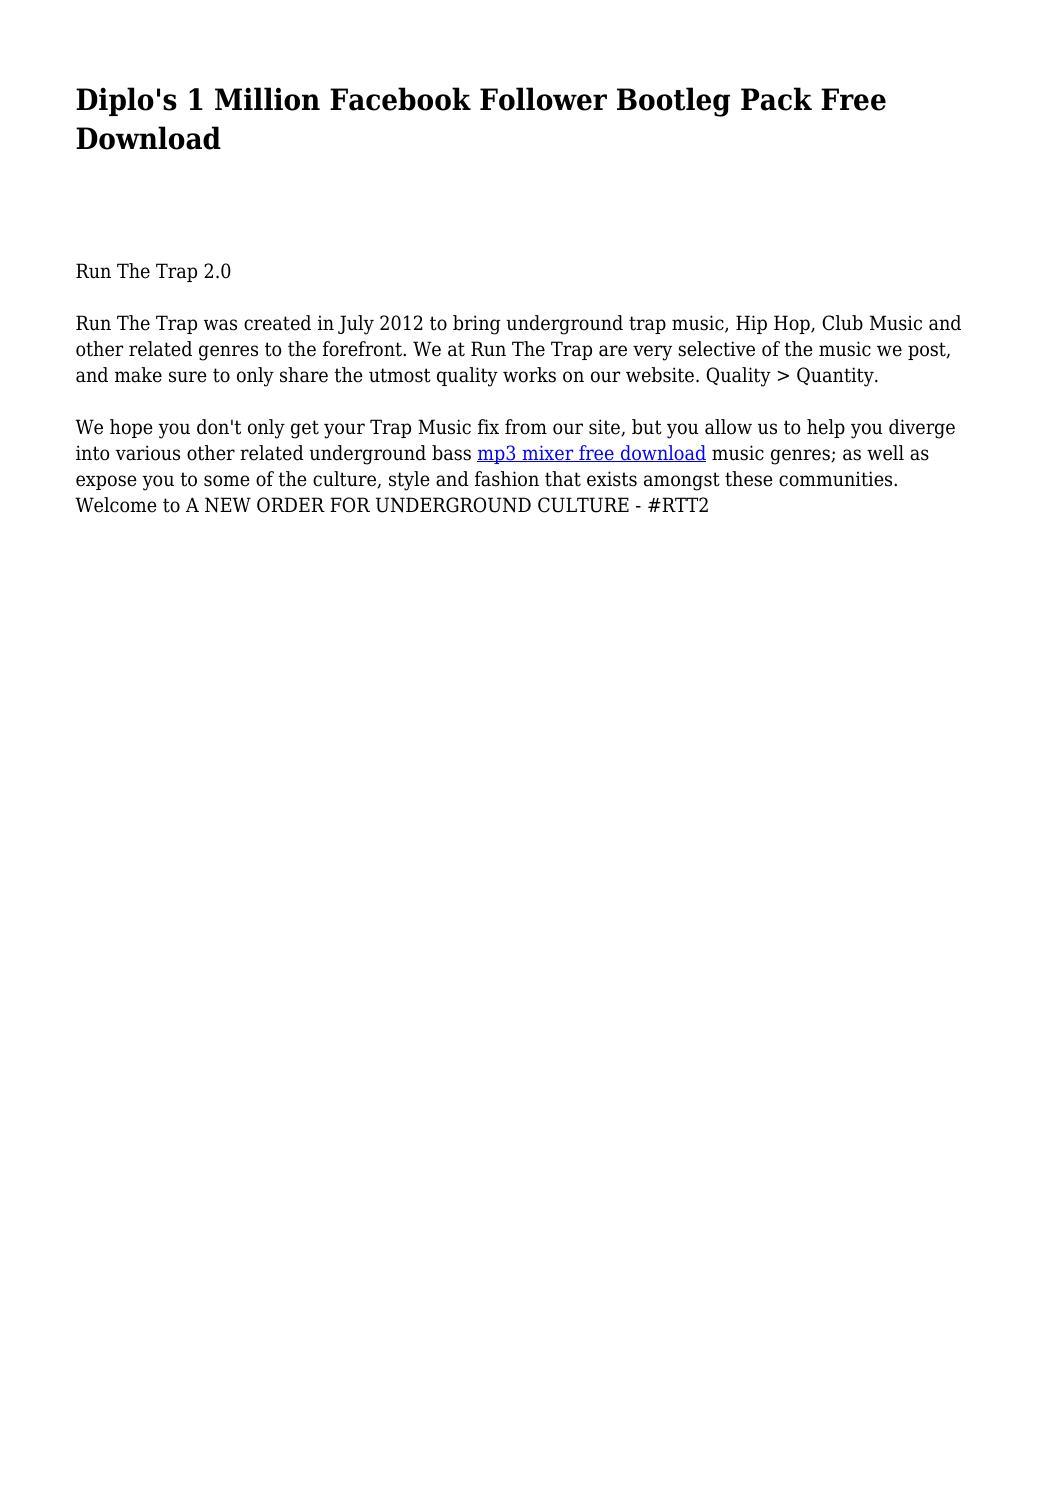 Diplo's 1 Million Facebook Follower Bootleg Pack Free